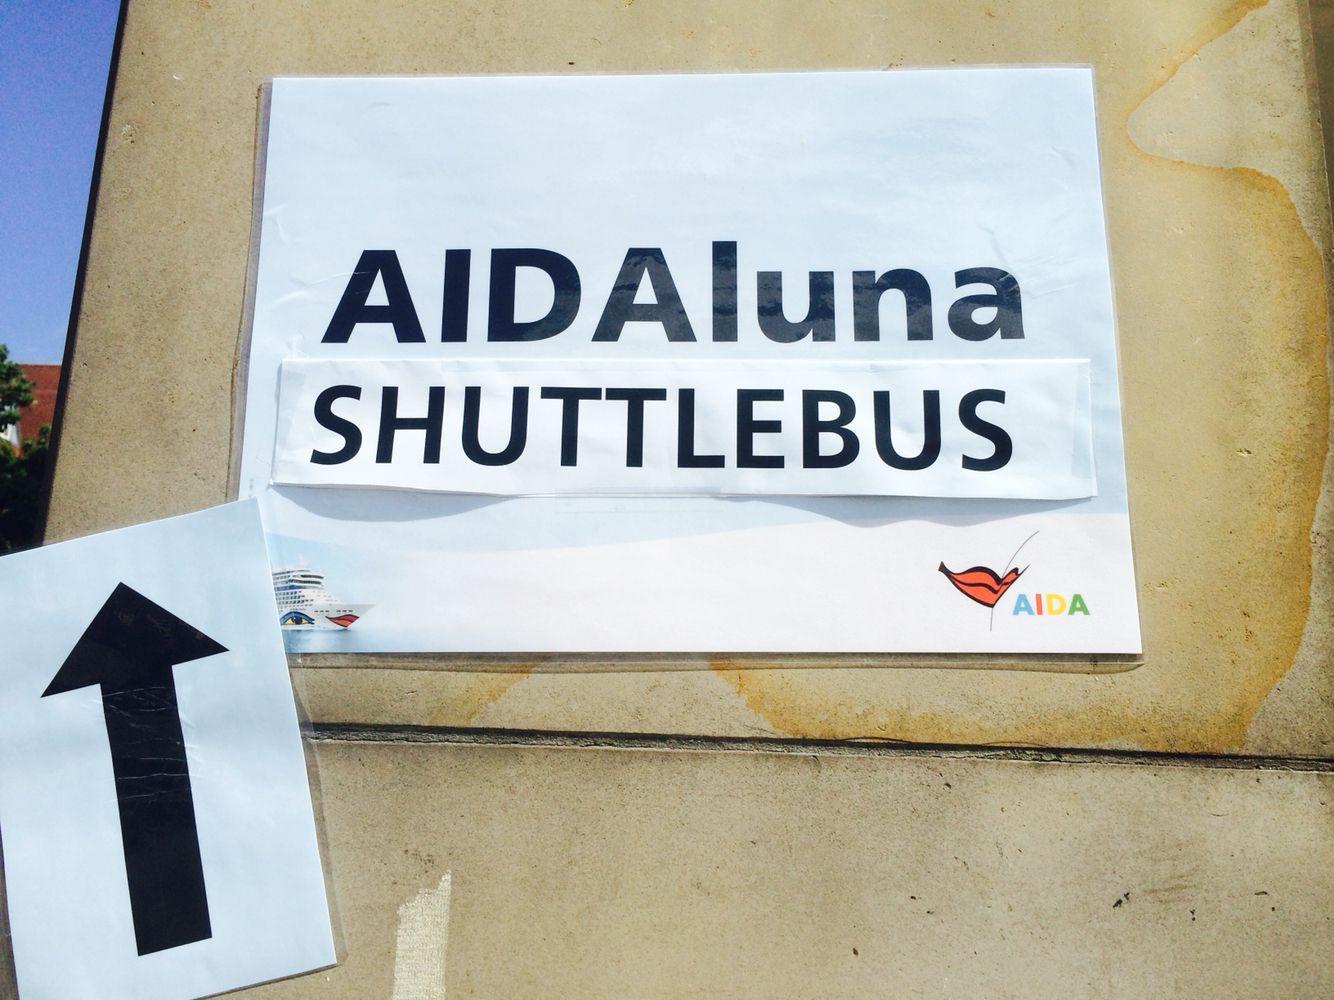 AIDAluna Shuttlebus